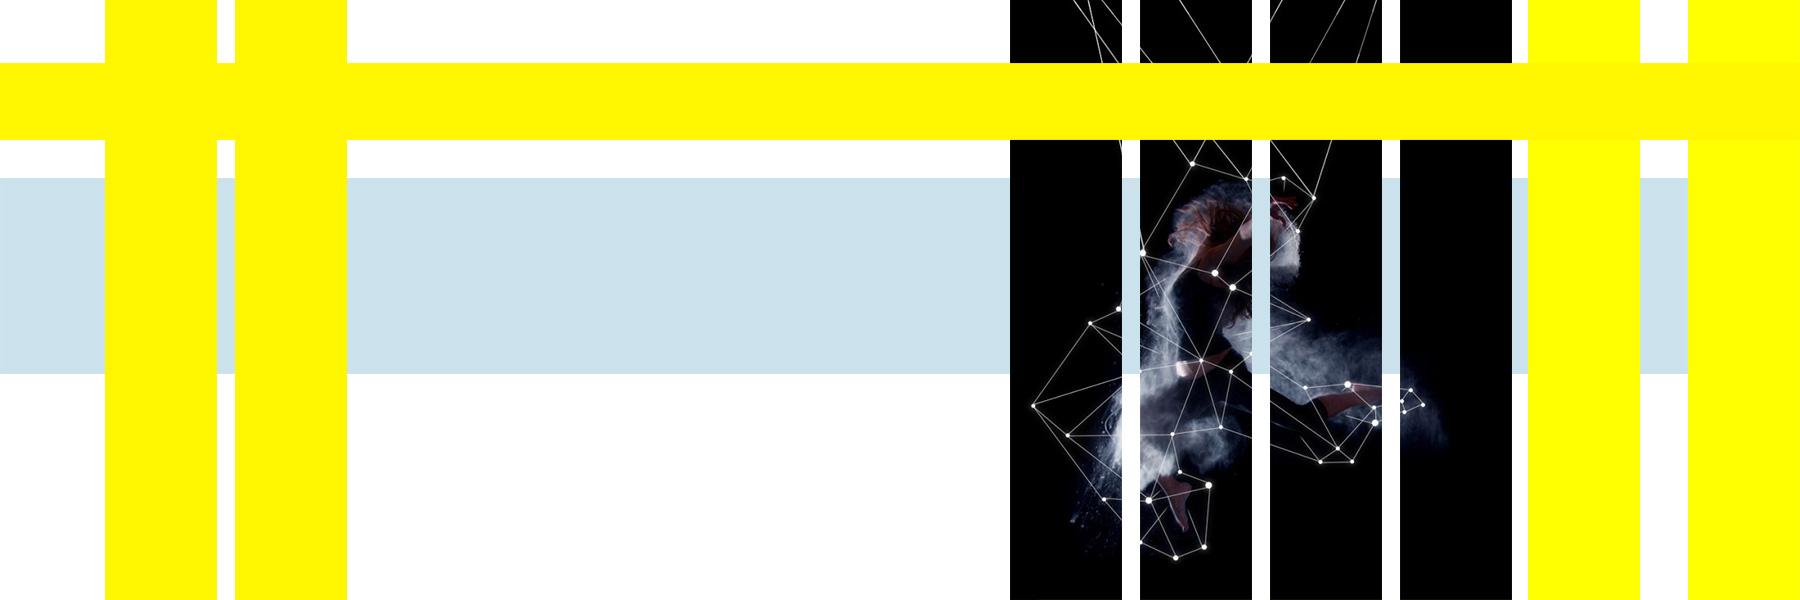 irotee-global-design-office-design-for-innovation-design-strategies-intermezzo131